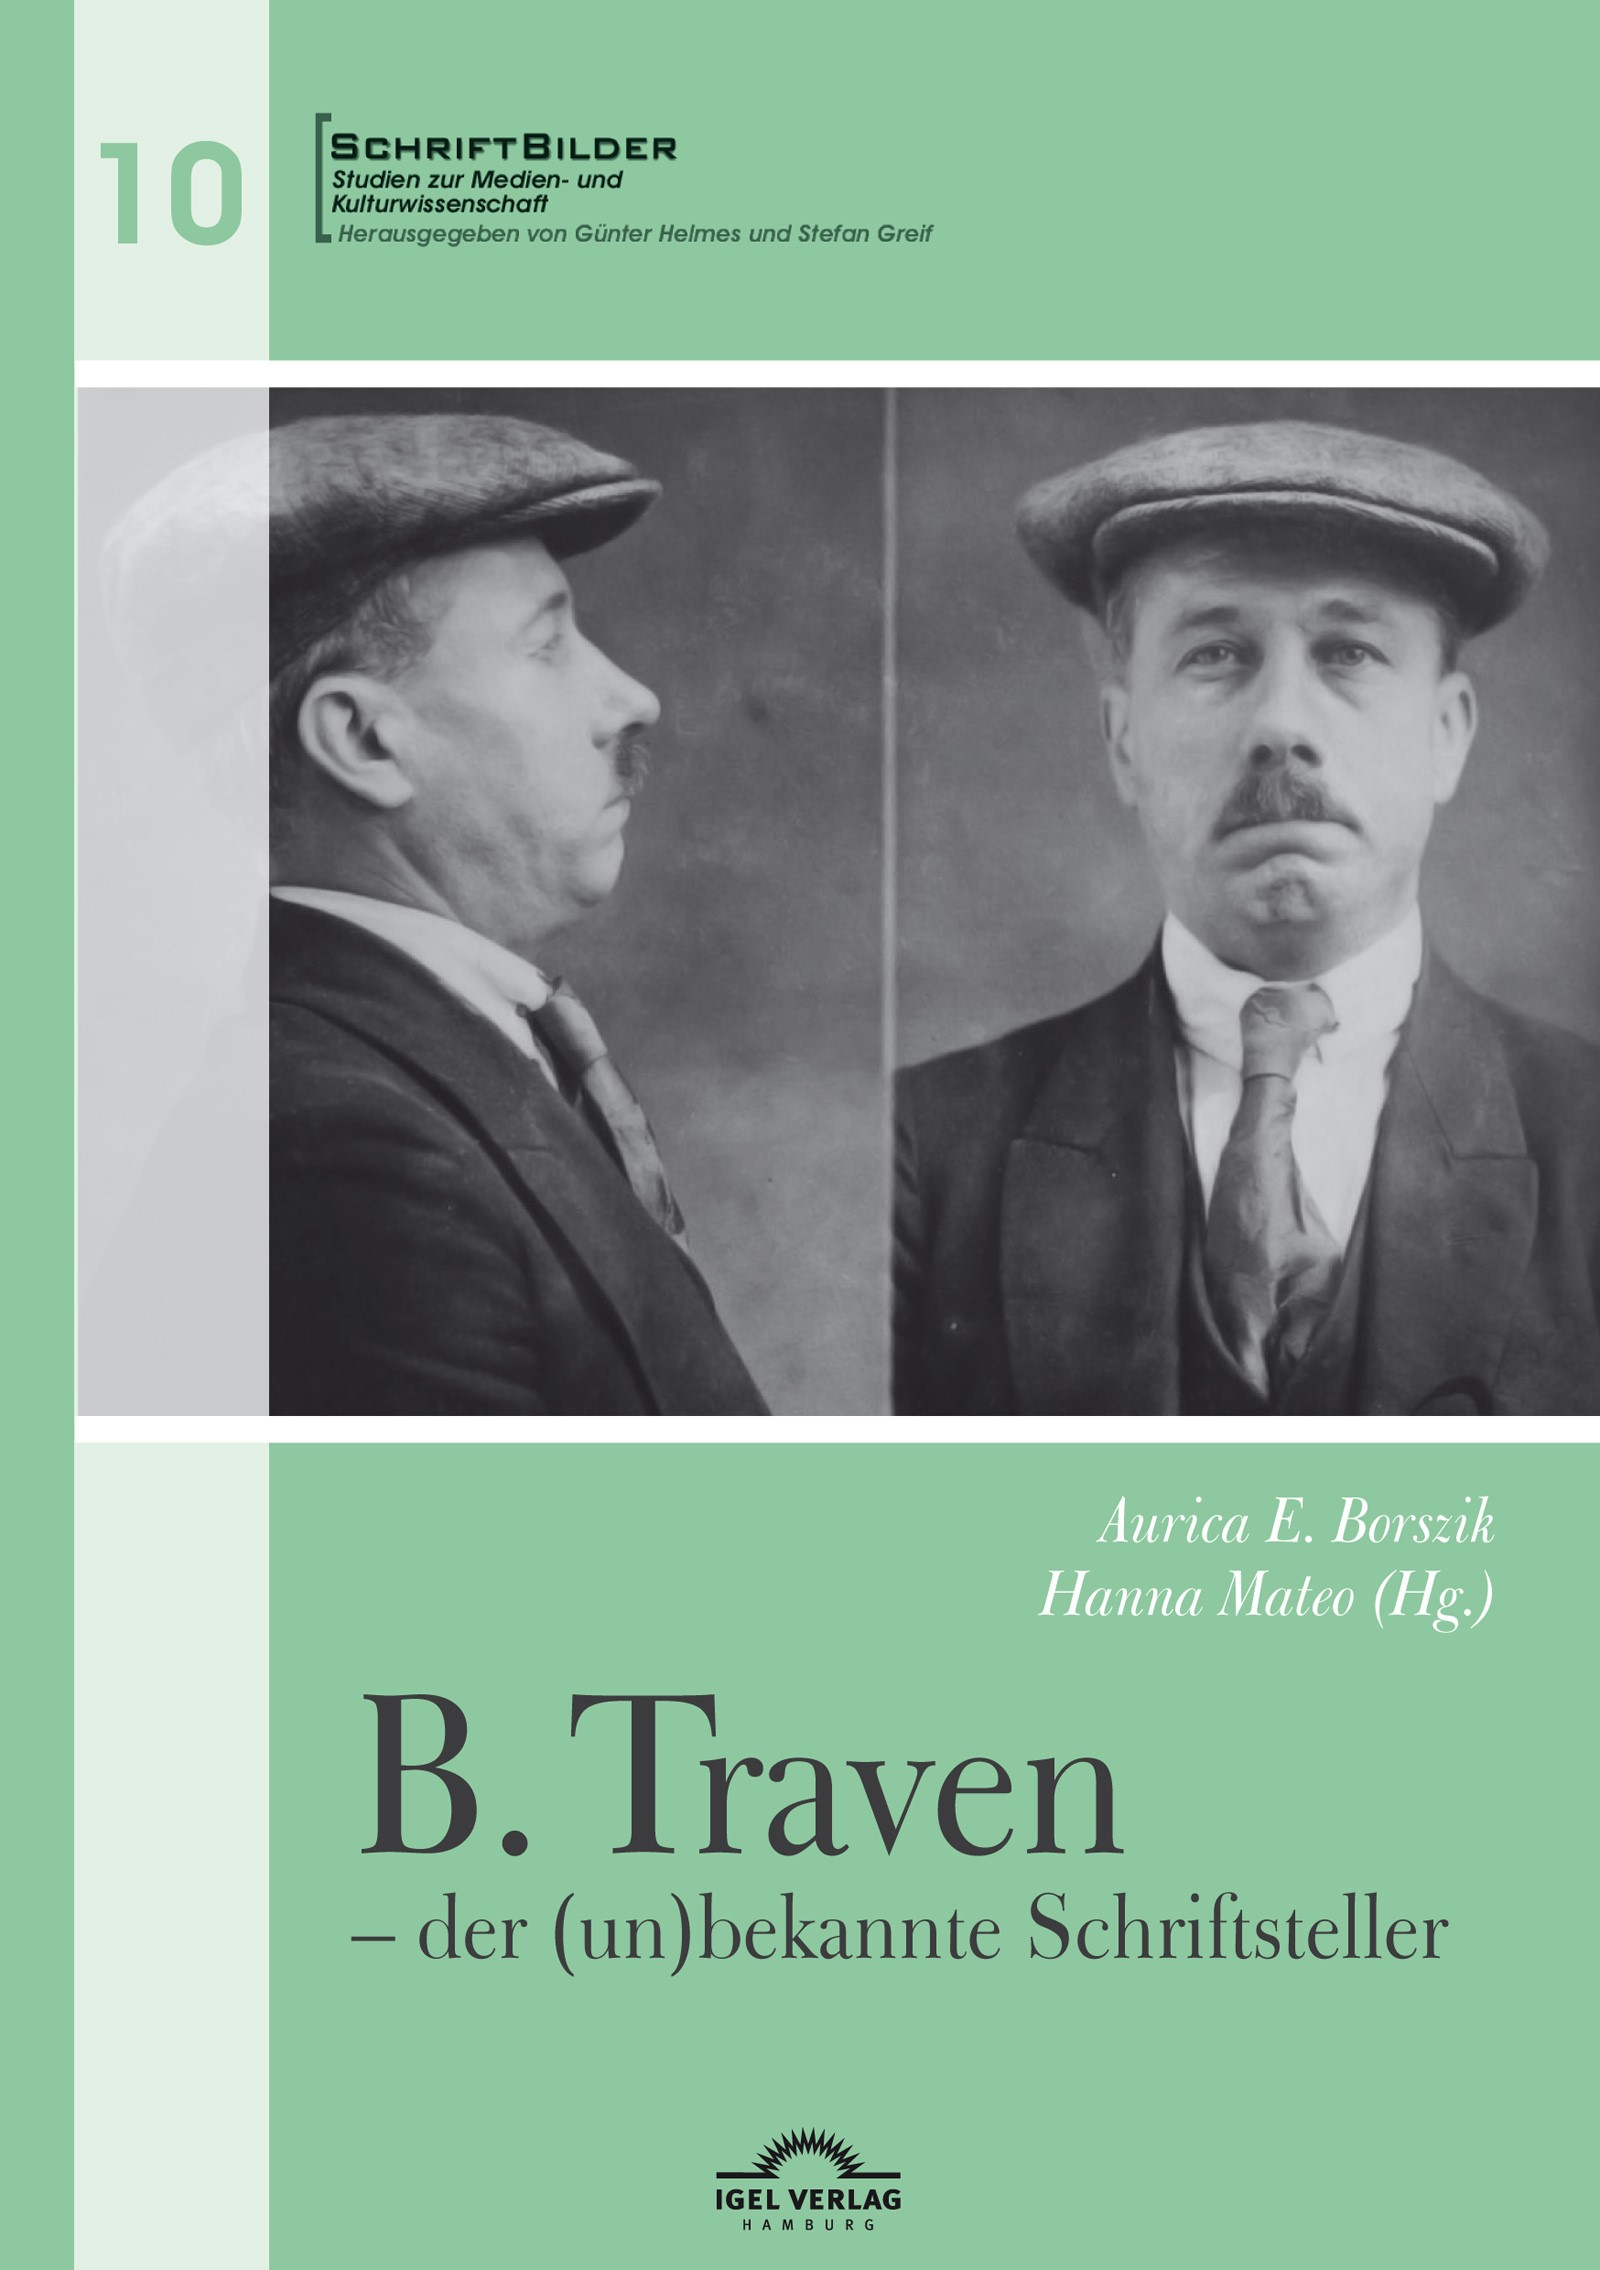 B. Traven – der (un)bekannte Schriftsteller | Borszik / Mateo | Erstauflage, 2017 | Buch (Cover)